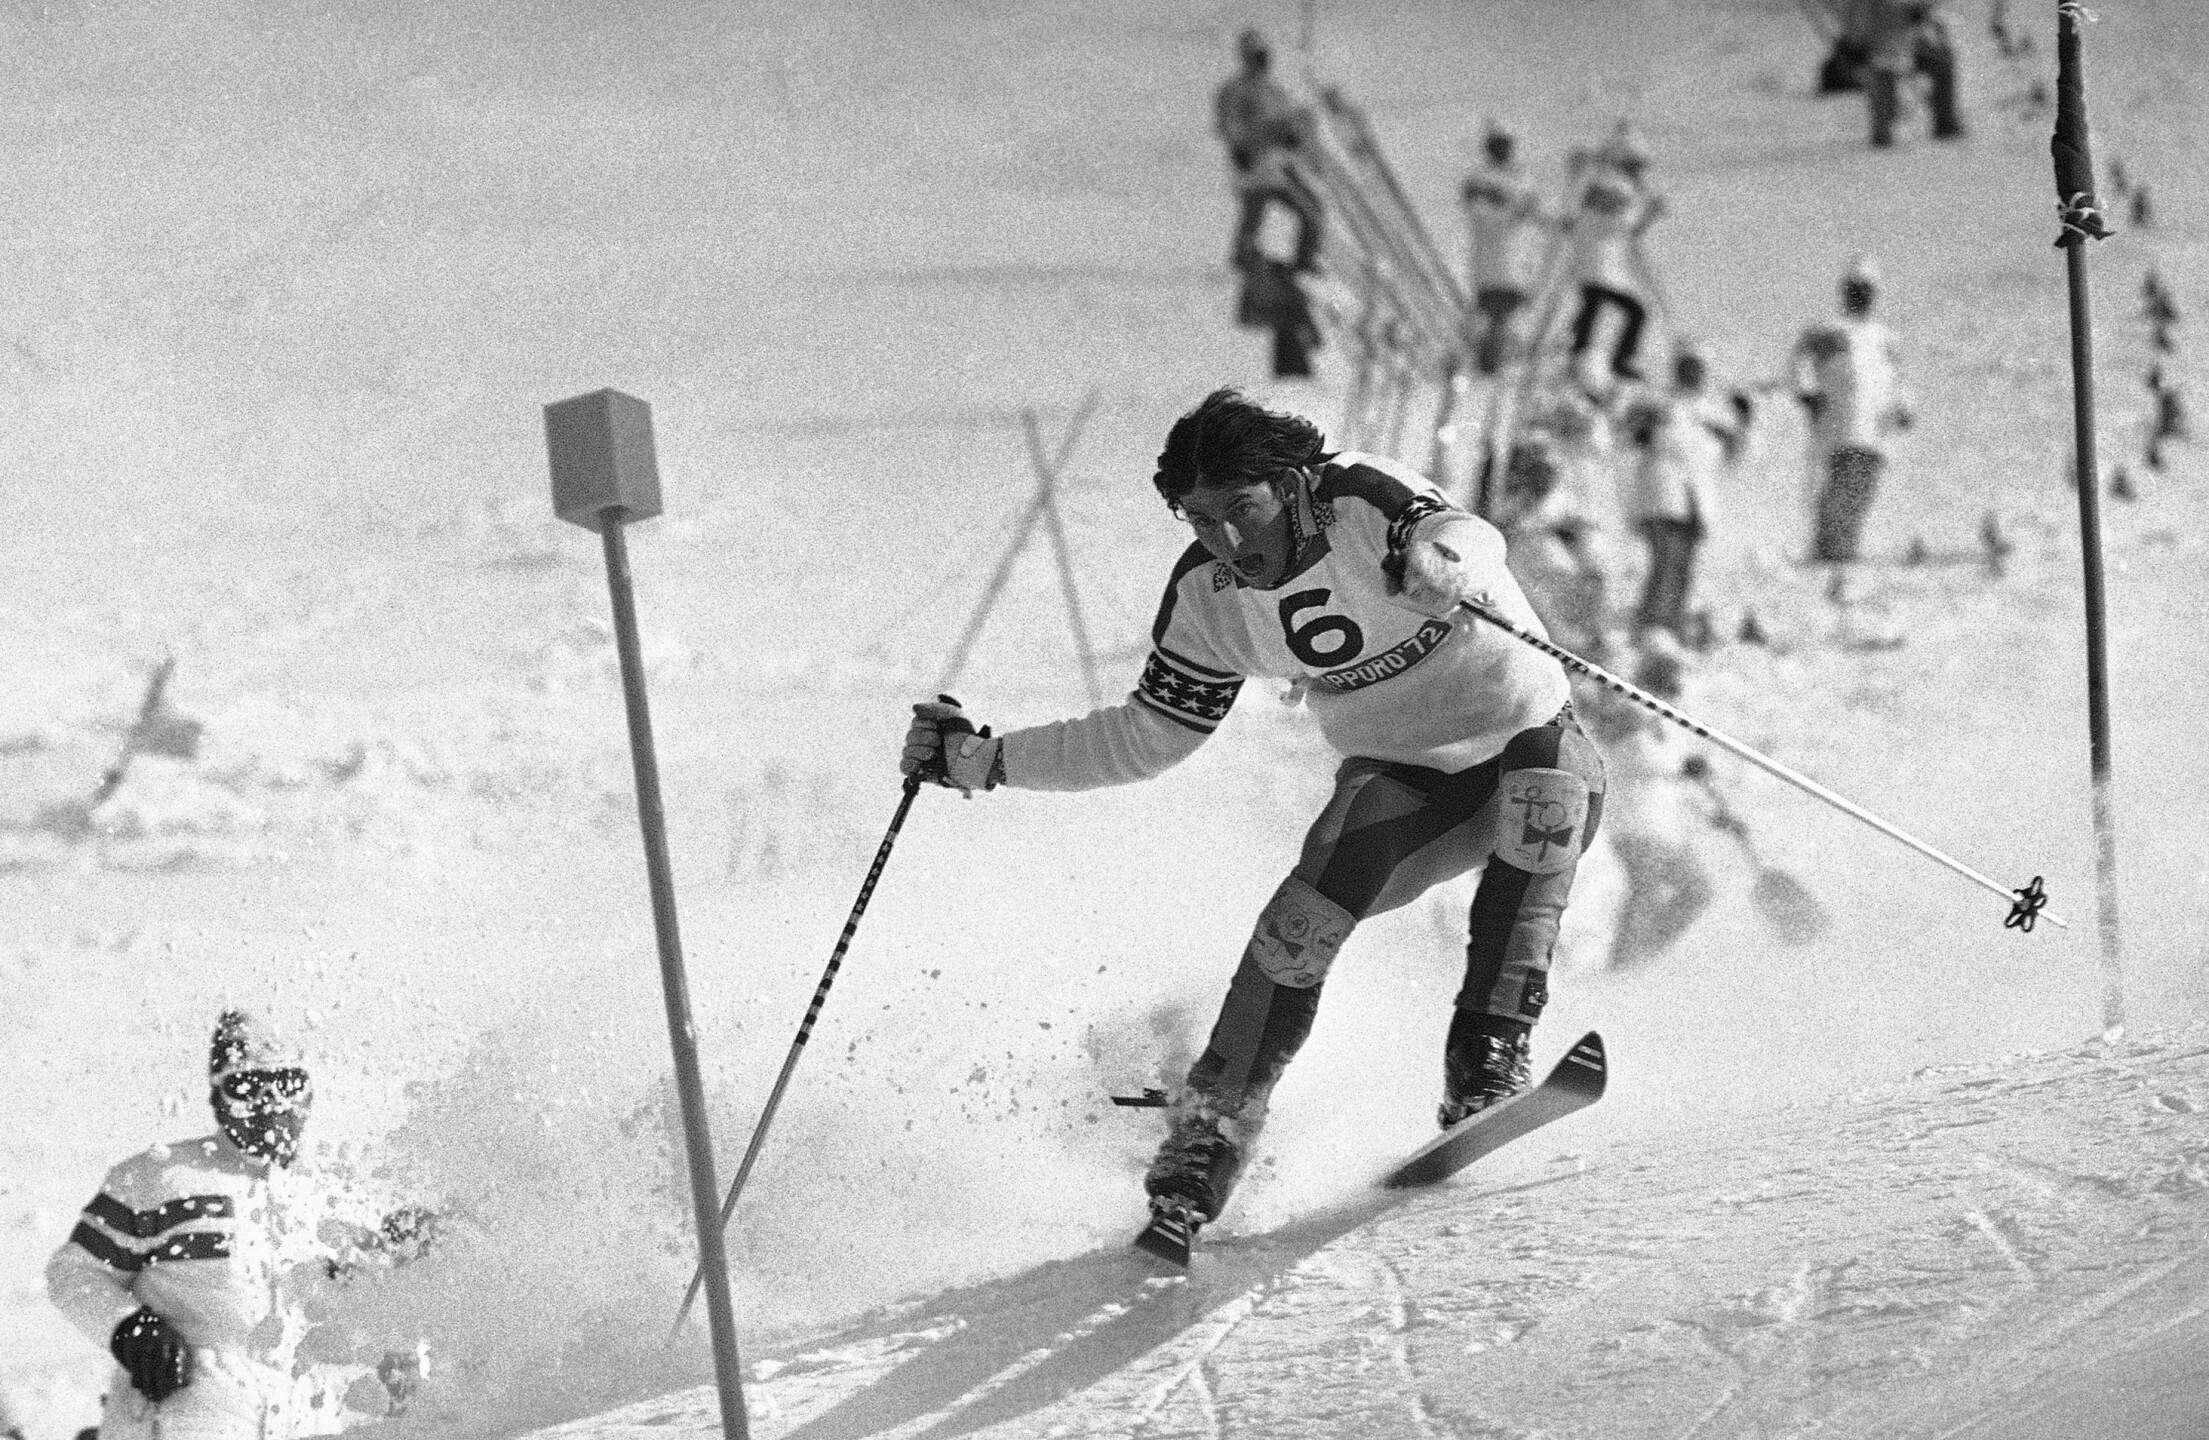 Winter Olympics 1972